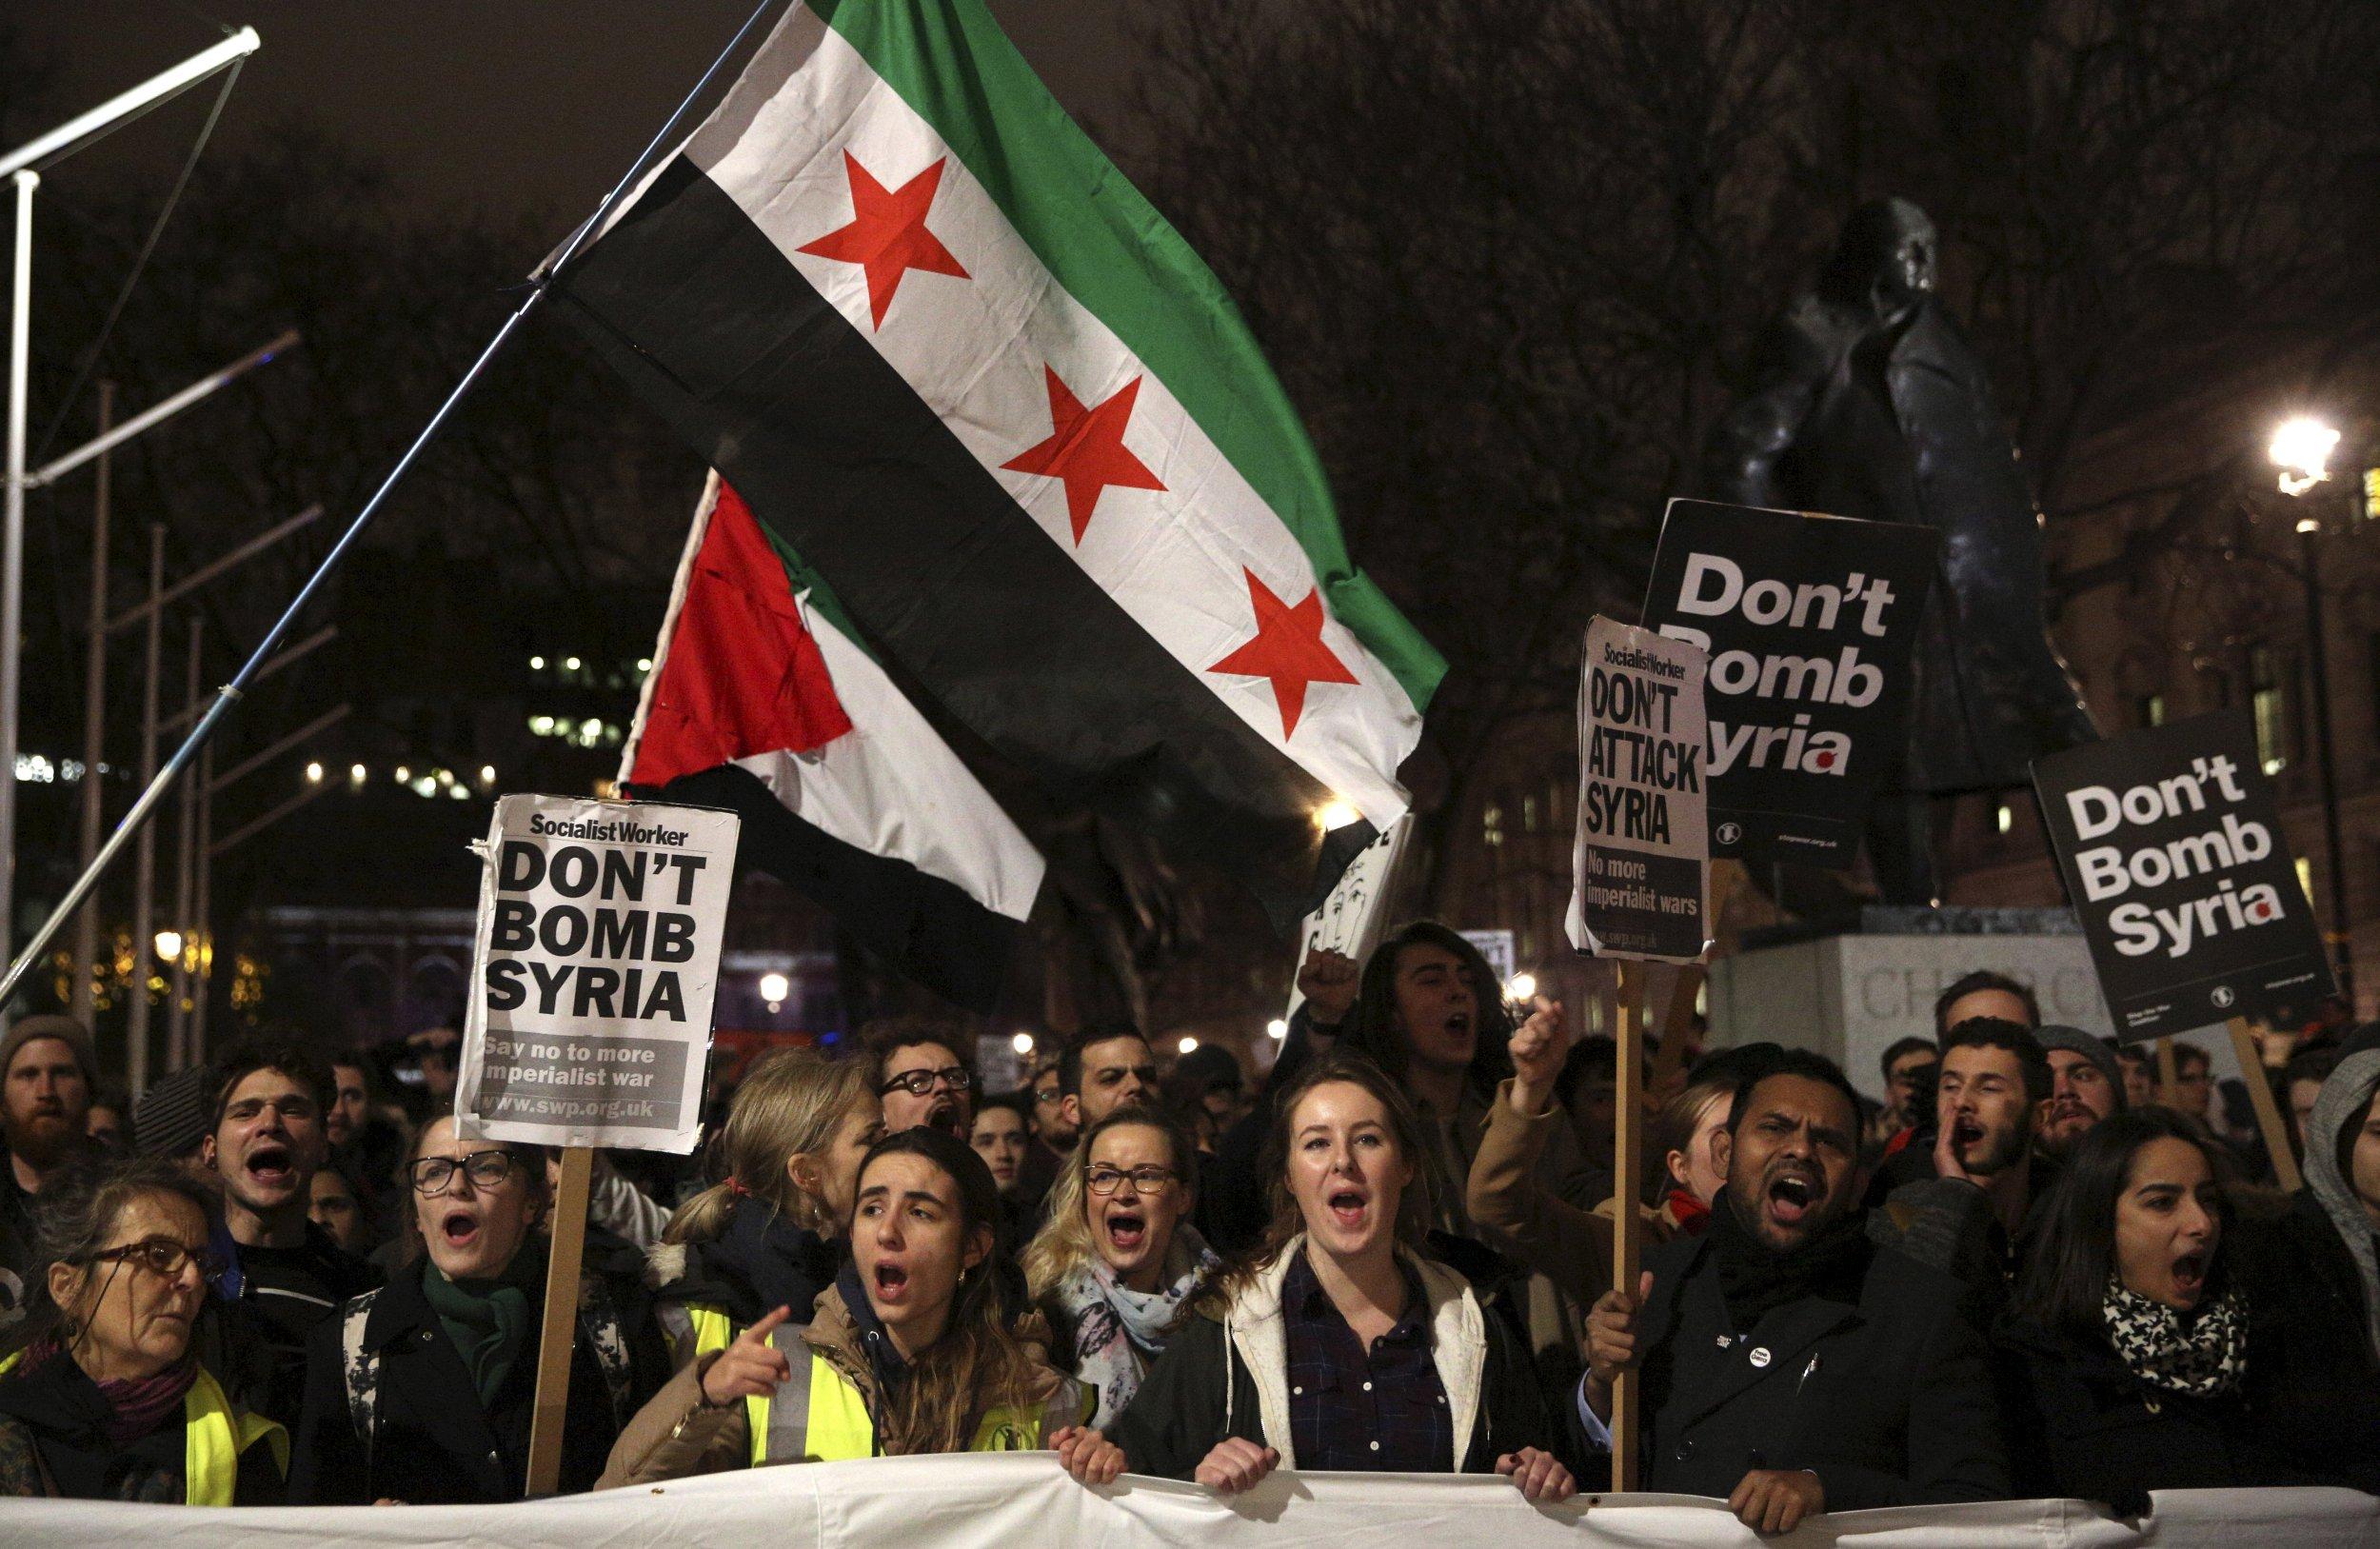 0212_protestors_syria_bombing